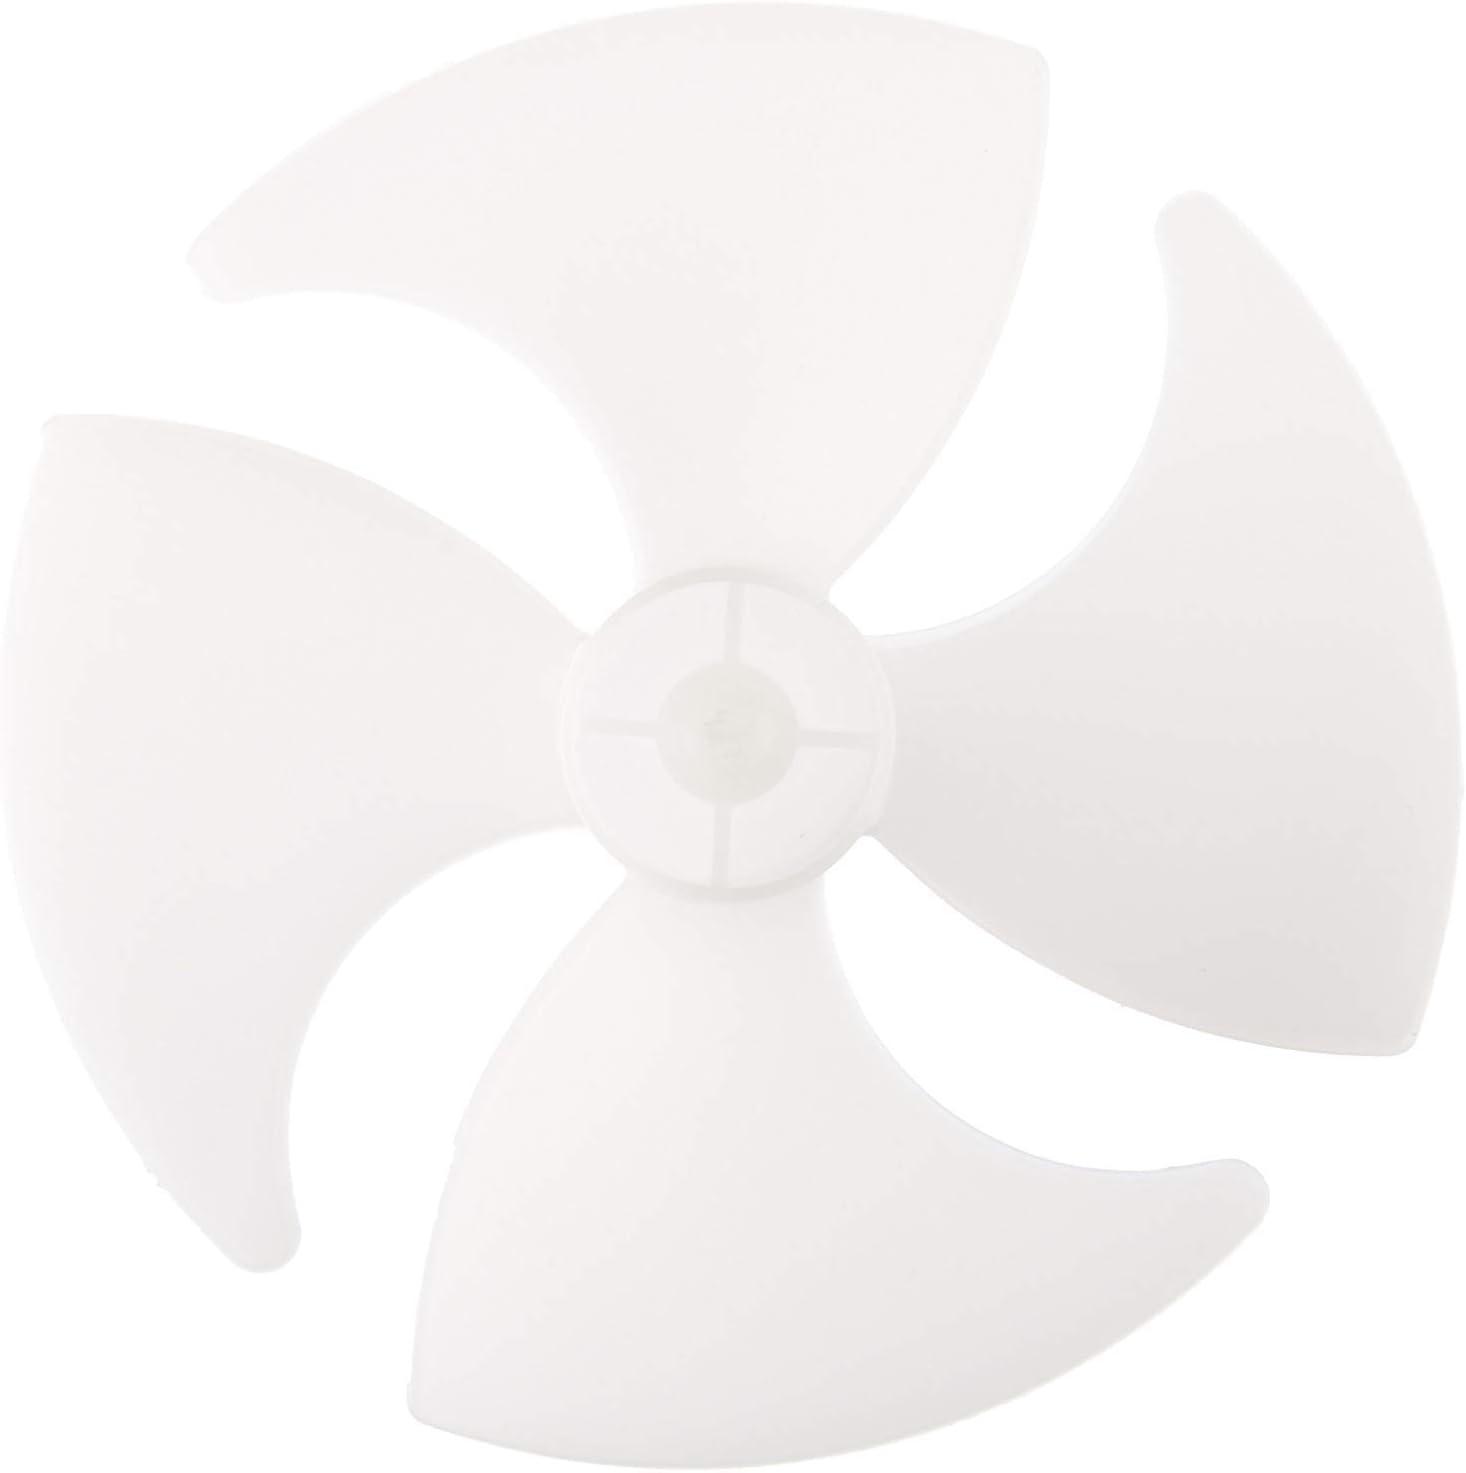 Lifetime Appliance 2169142 Evaporator Fan Motor Blade for Whirlpool, Maytag, KitchenAid, Jenn-Air, Amana, Refrigerators - WP2169142